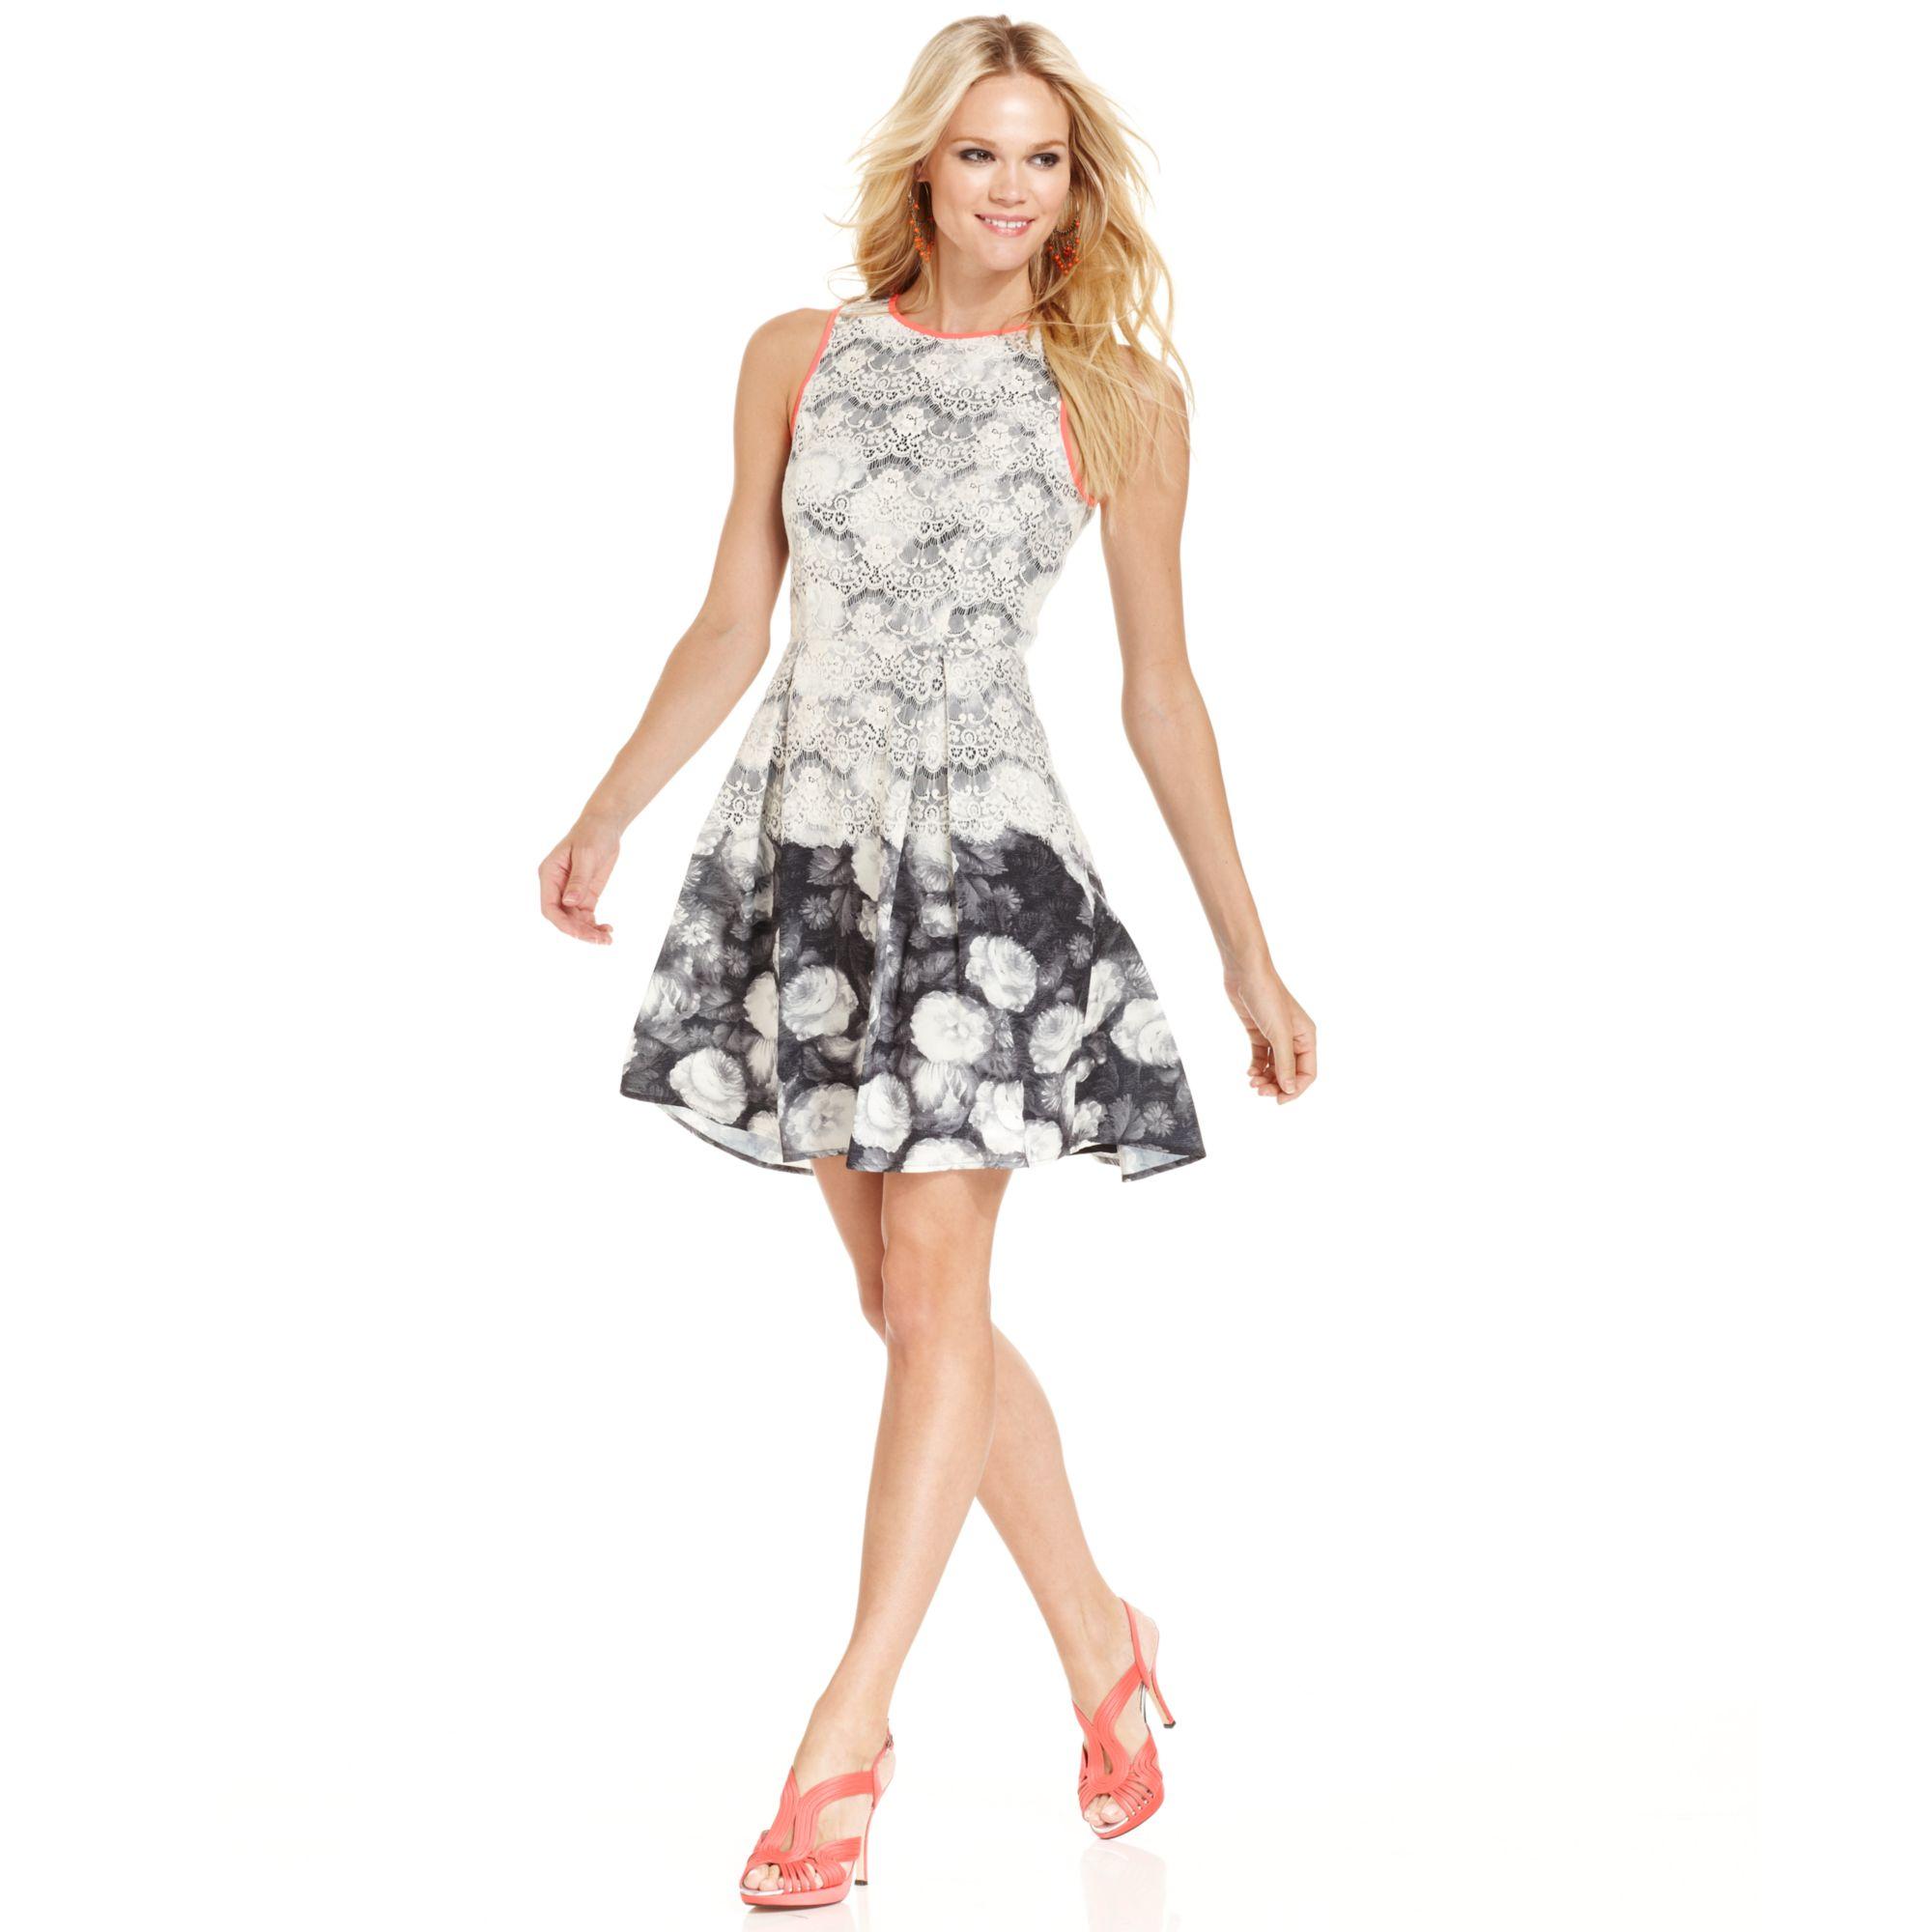 Jessica Simpson Dresses at Macy's